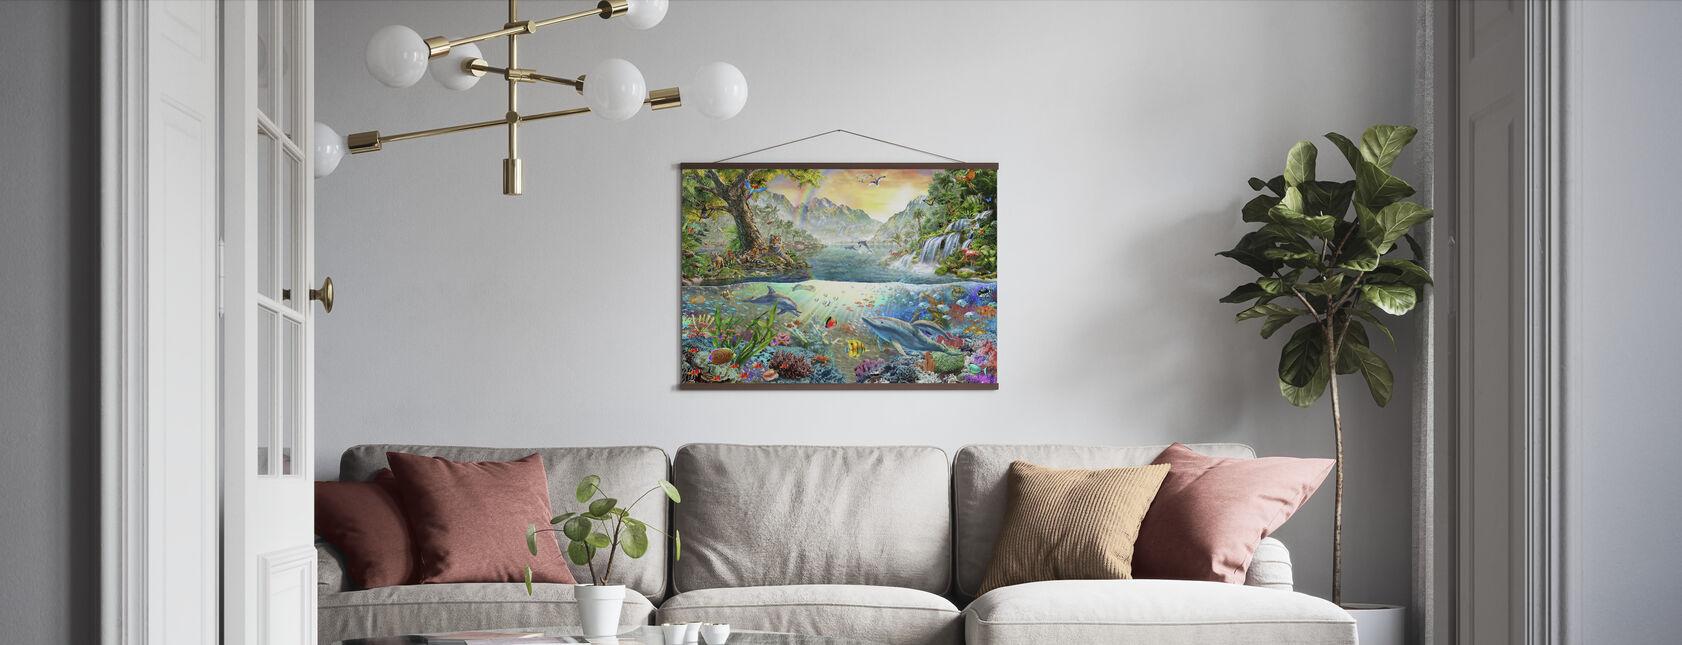 Land og vand Utopia - Plakat - Stue